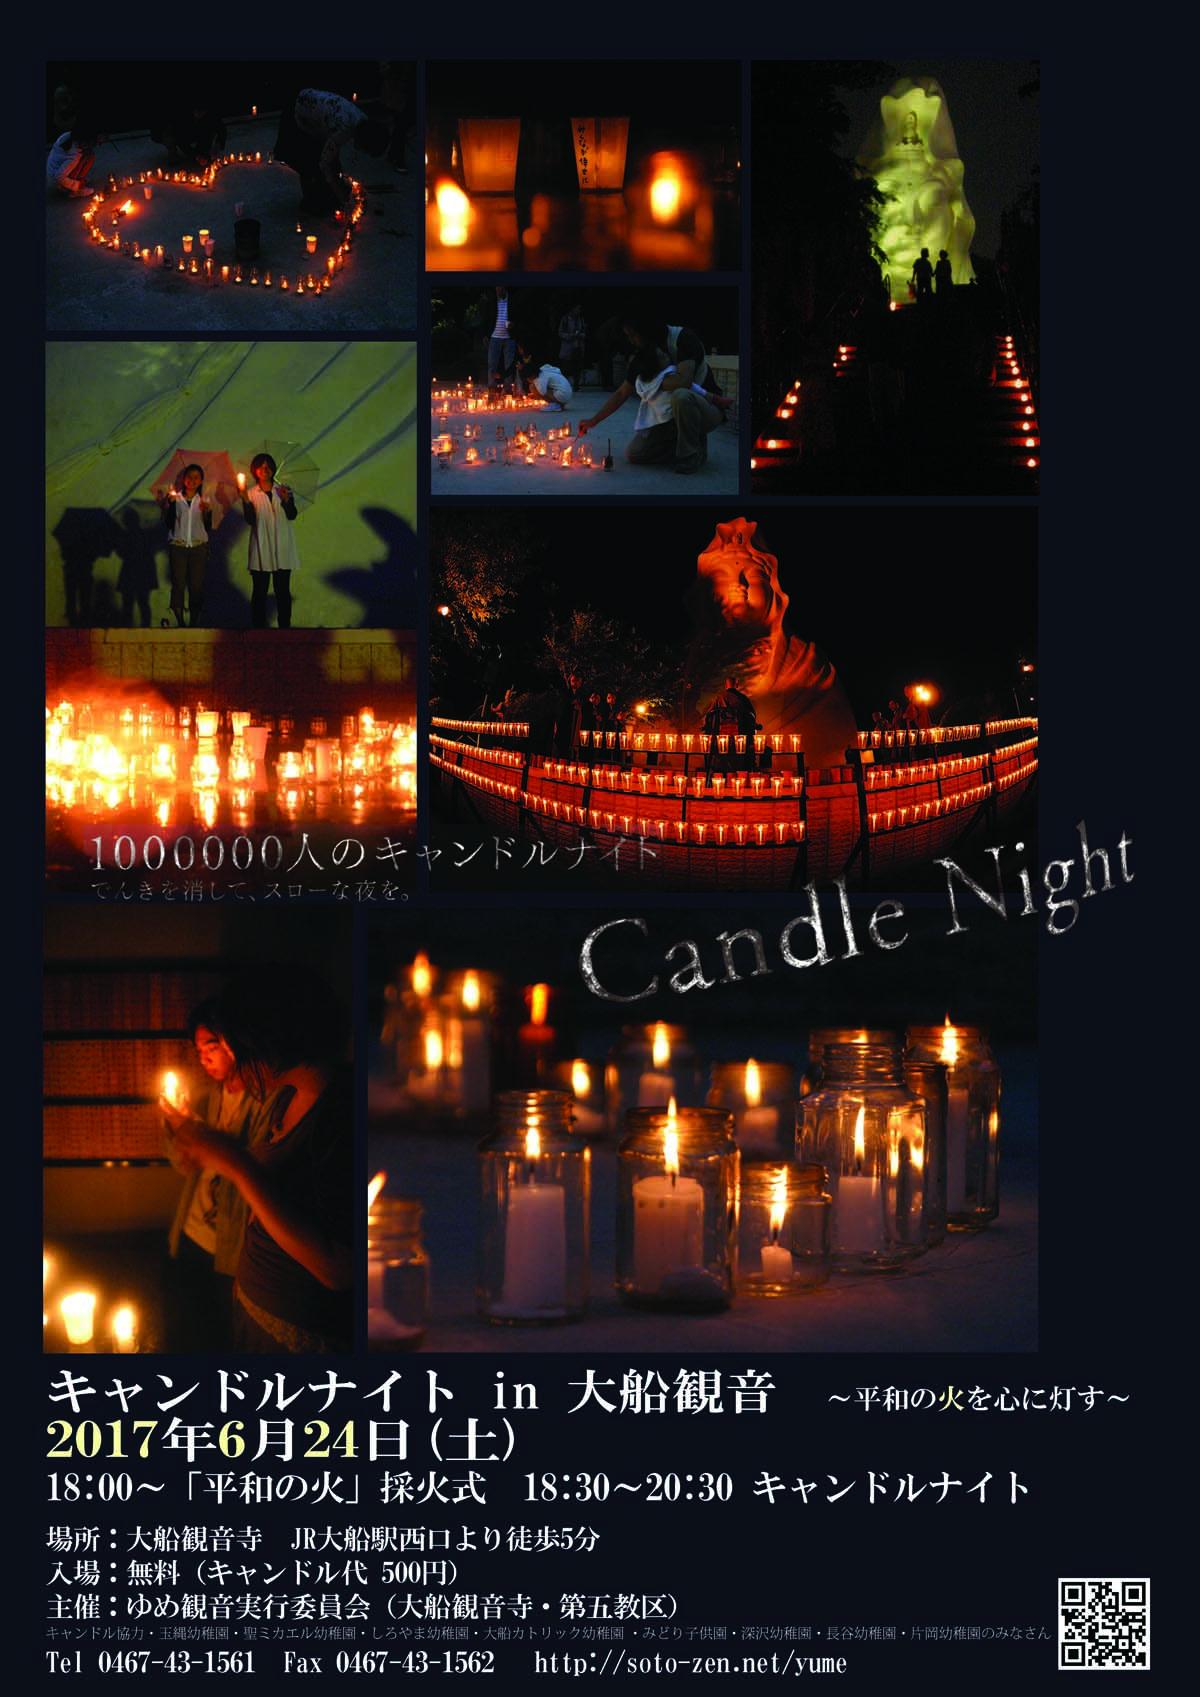 http://soto-zen.net/yume/2017candle.jpg